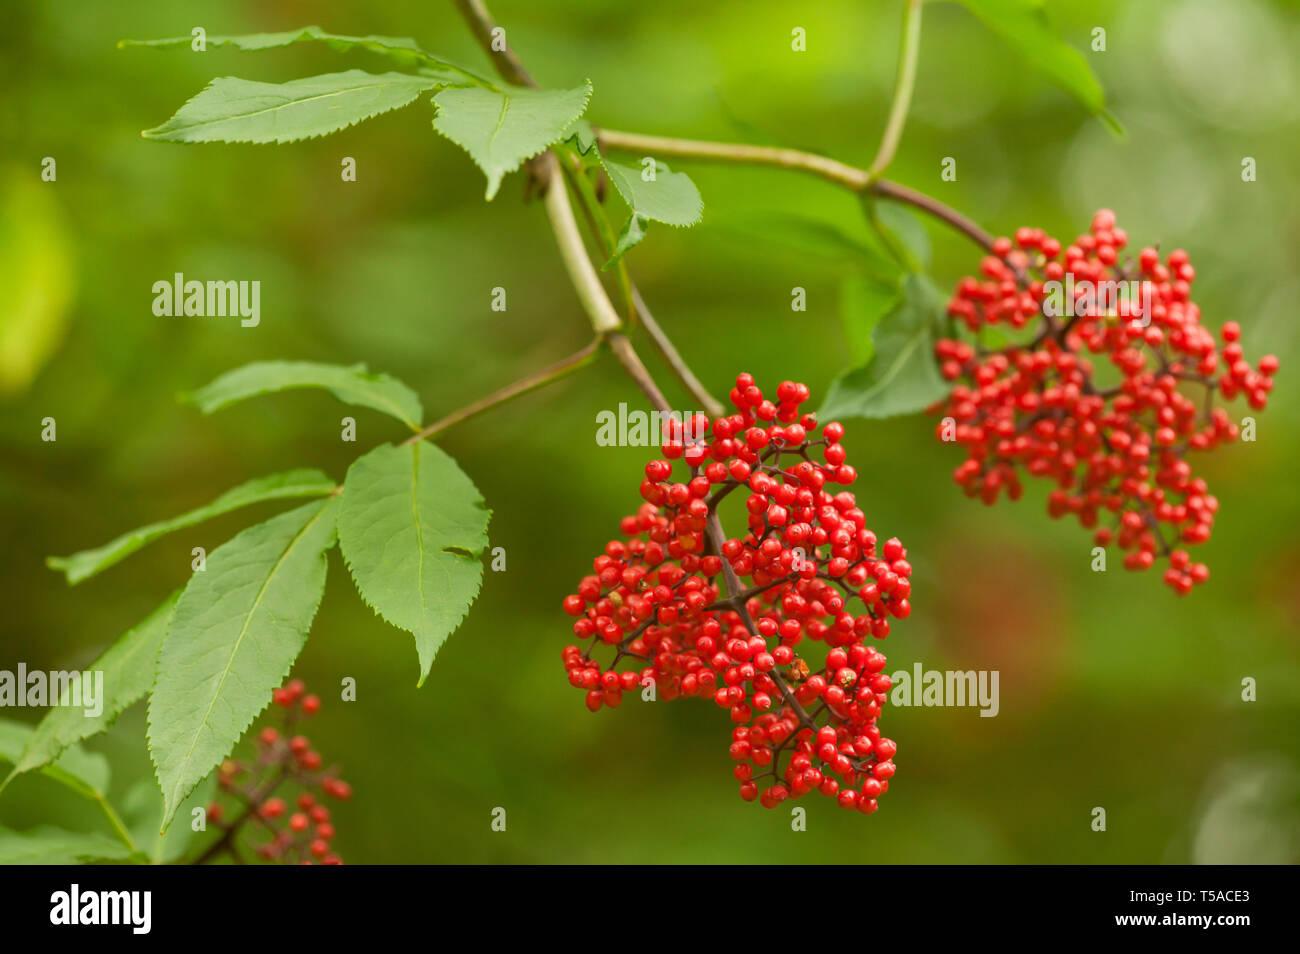 Red Elderberry Tree With Red Berries In Western Washington Grows